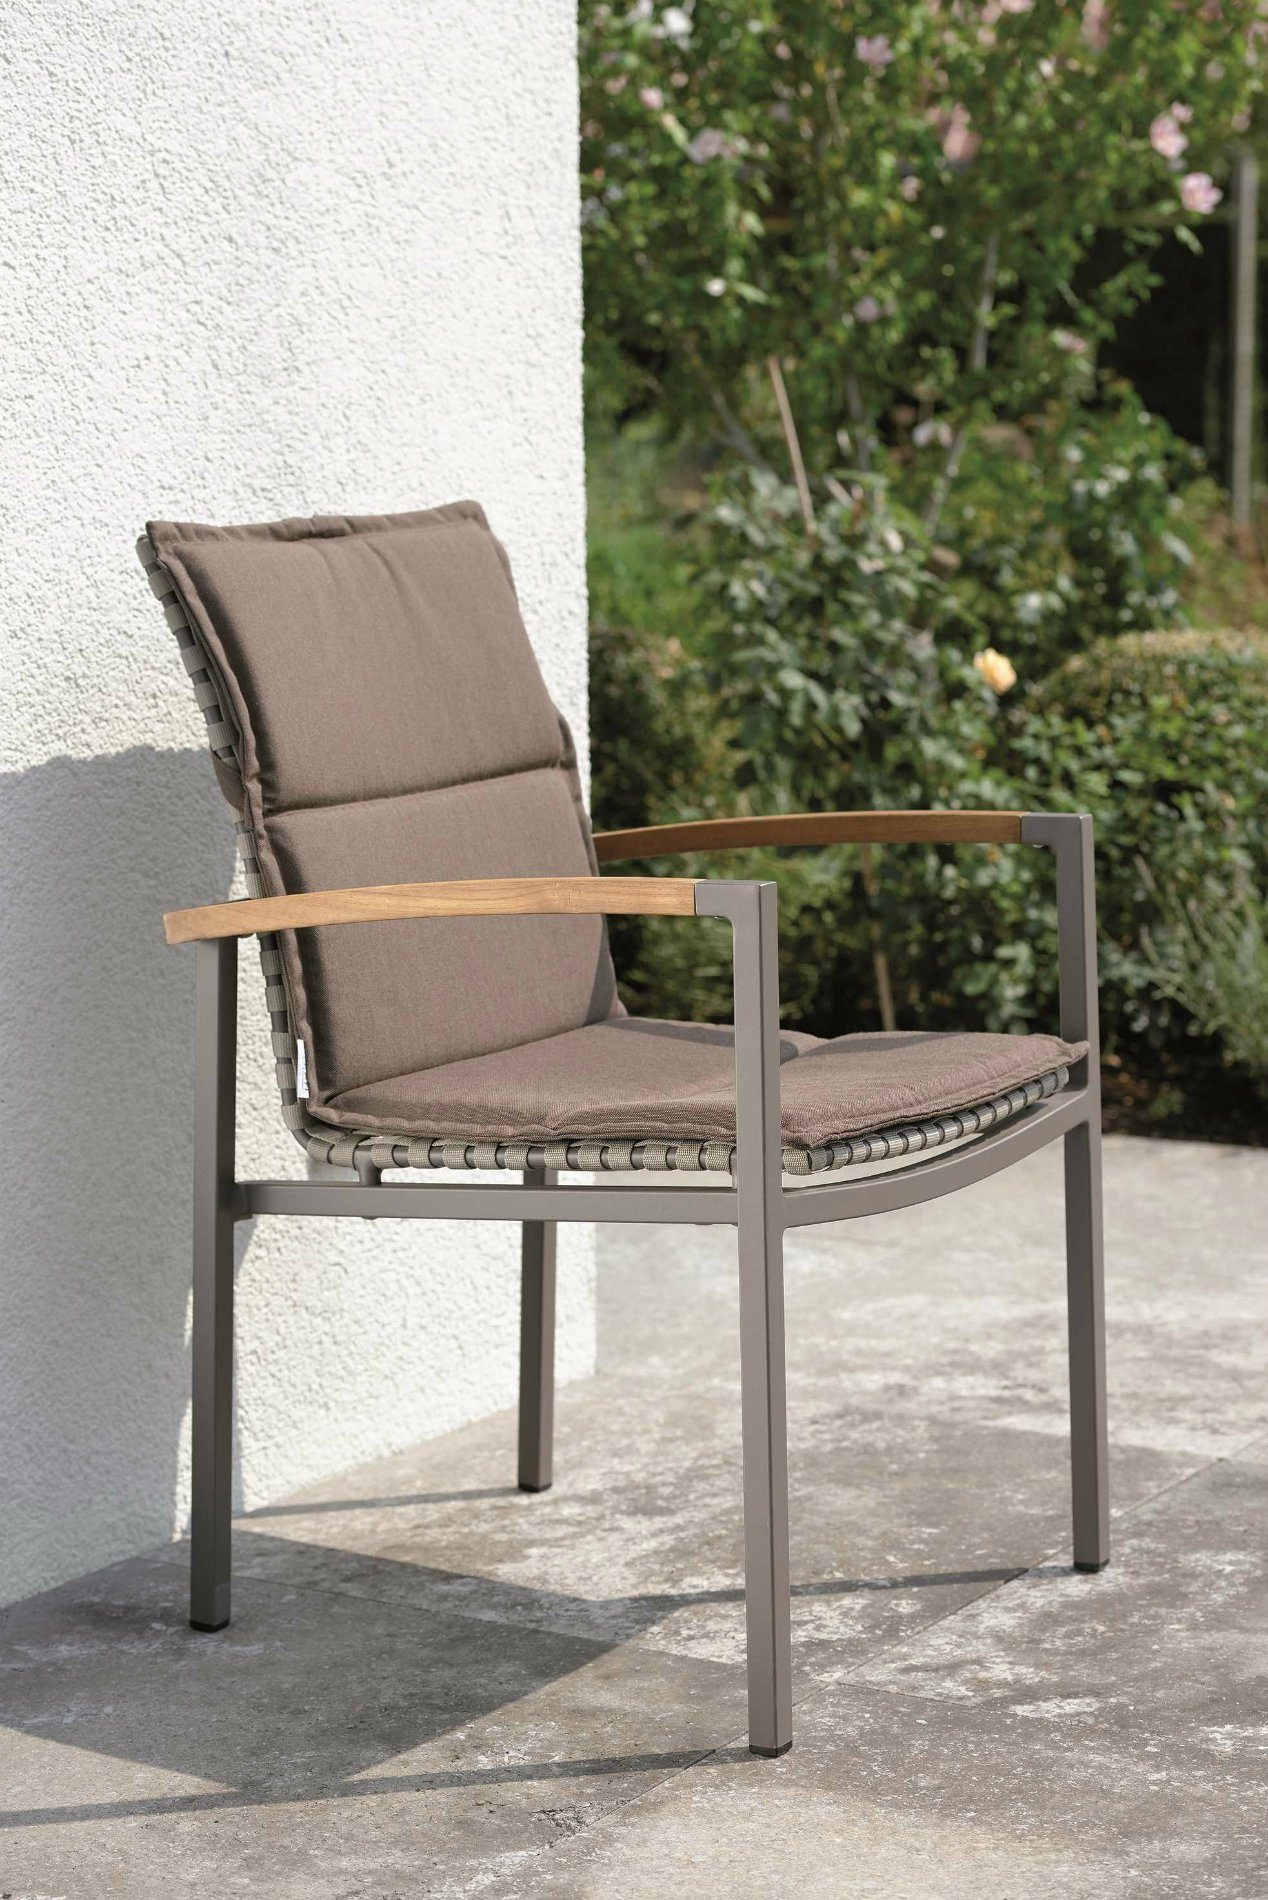 stern lucy stapelsessel. Black Bedroom Furniture Sets. Home Design Ideas